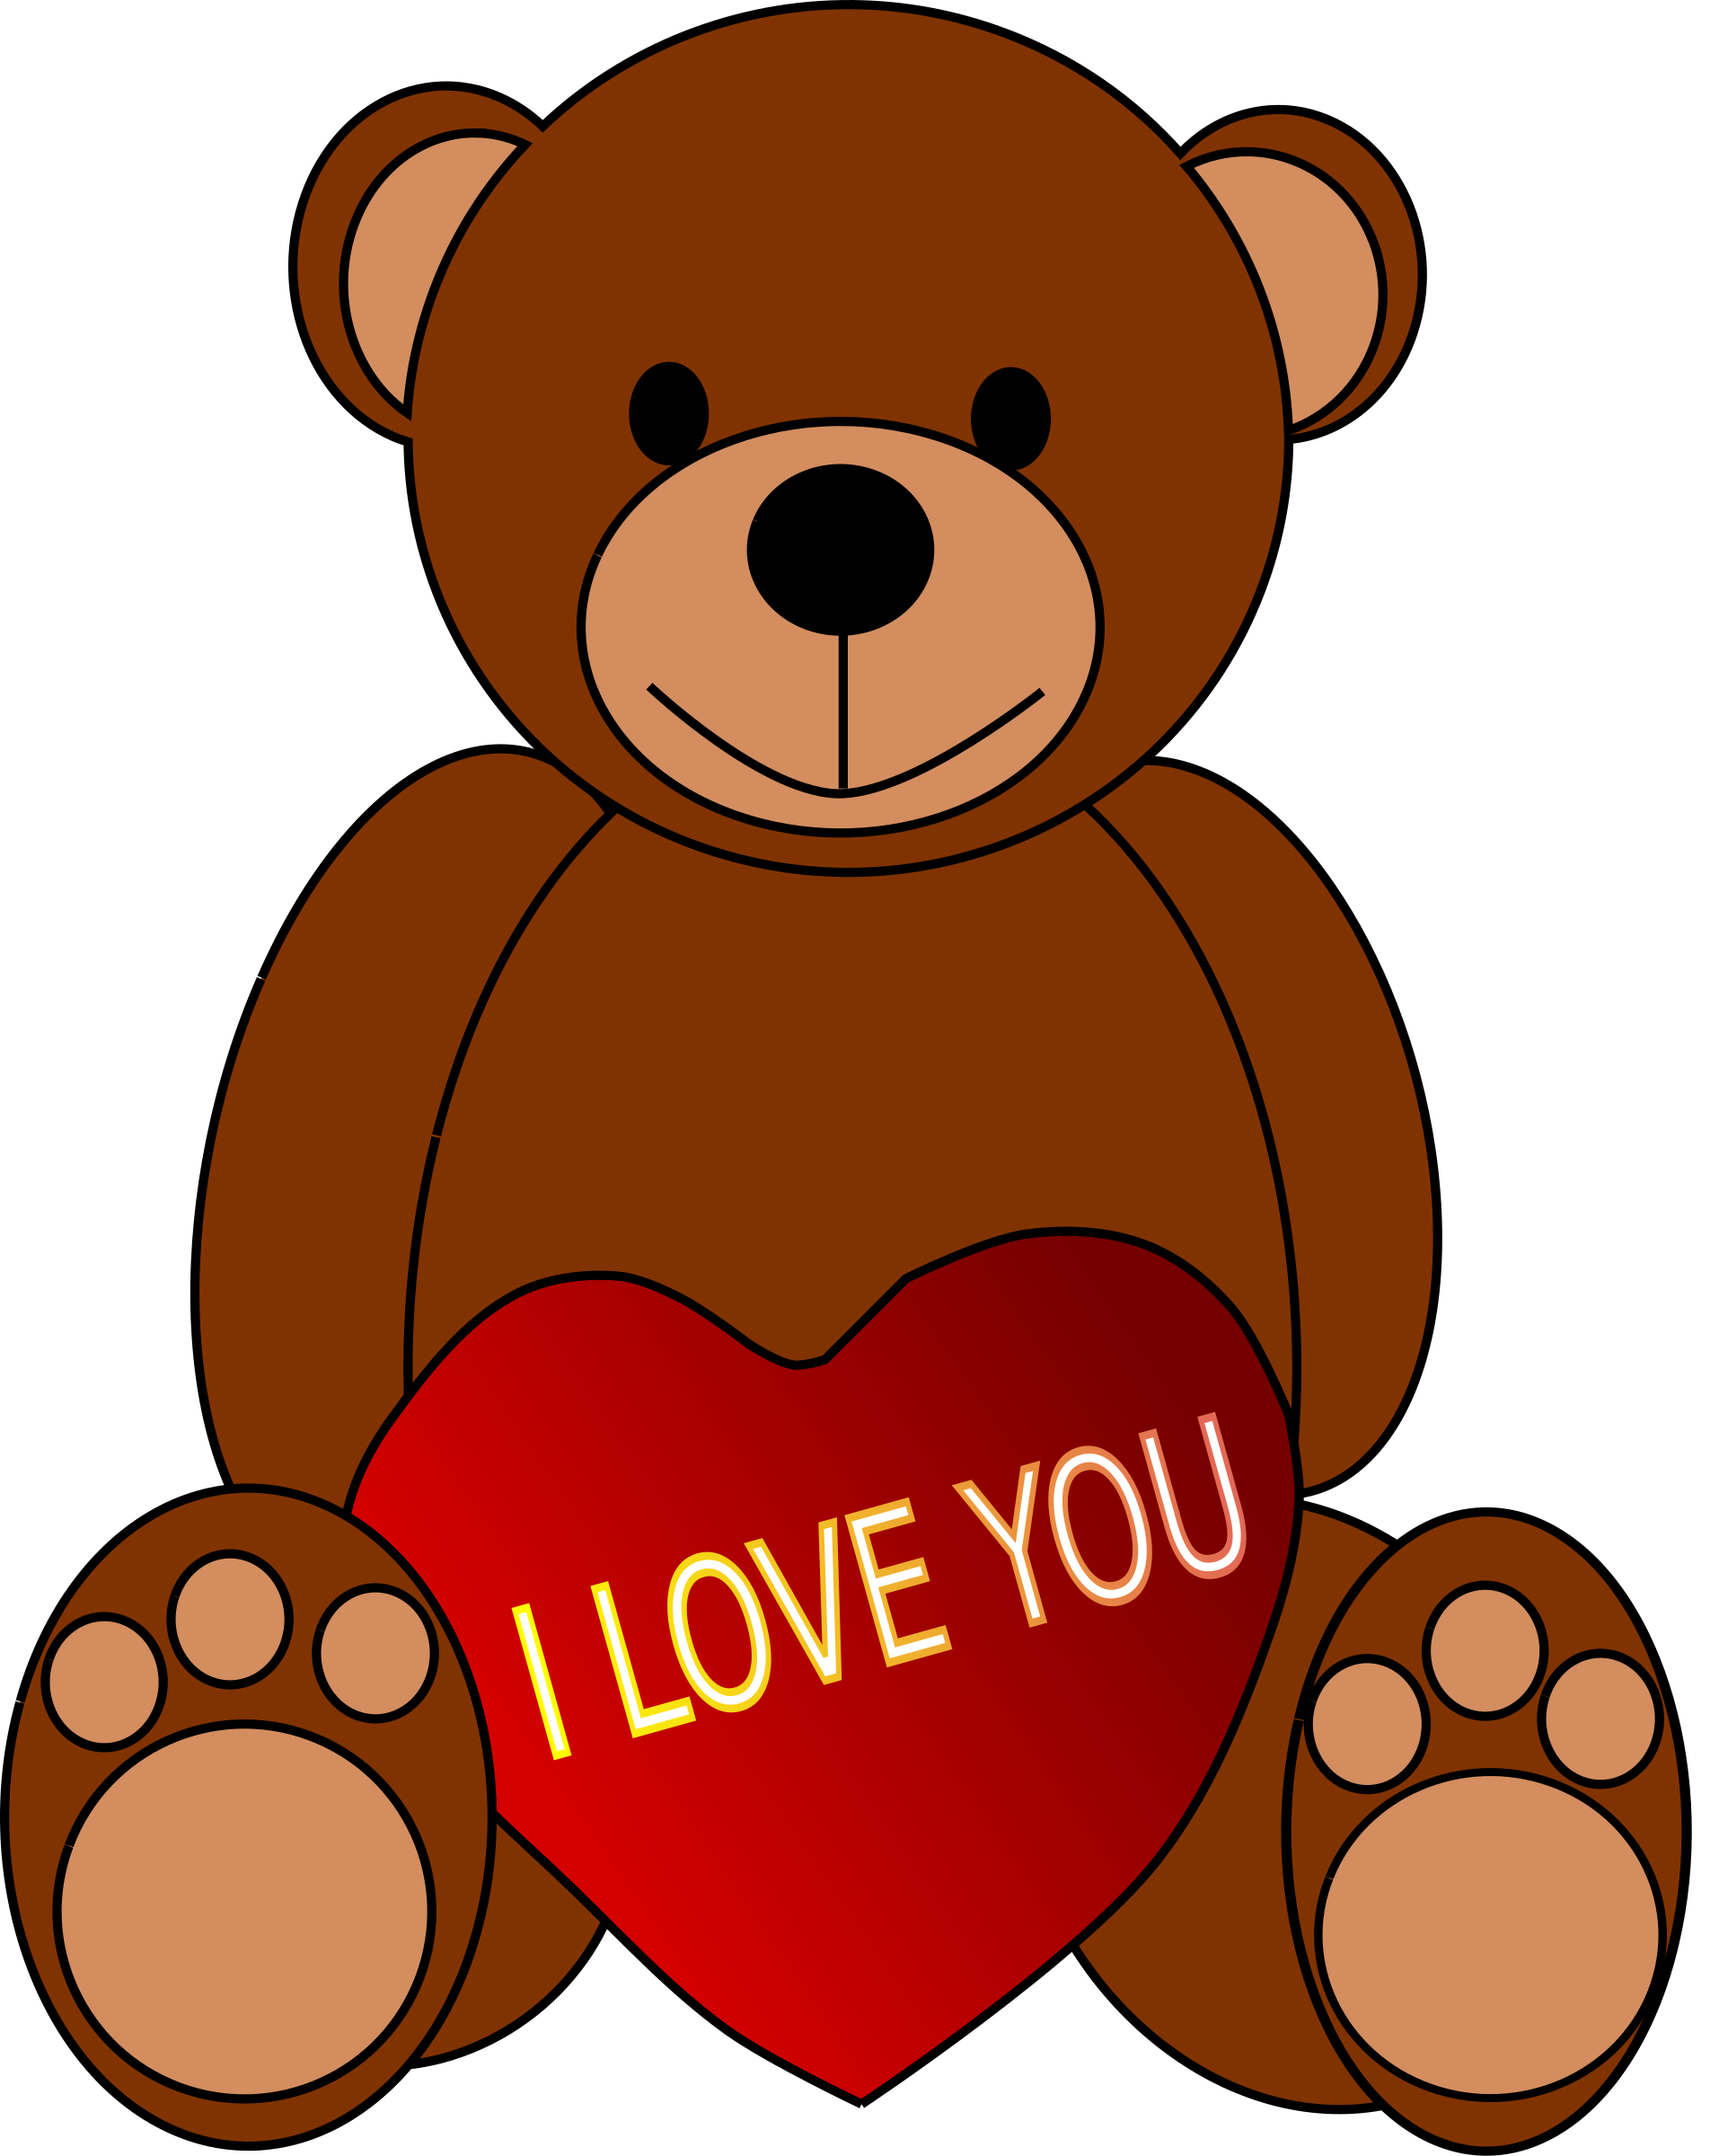 Valentine s day teddy. Clipart bear valentine's